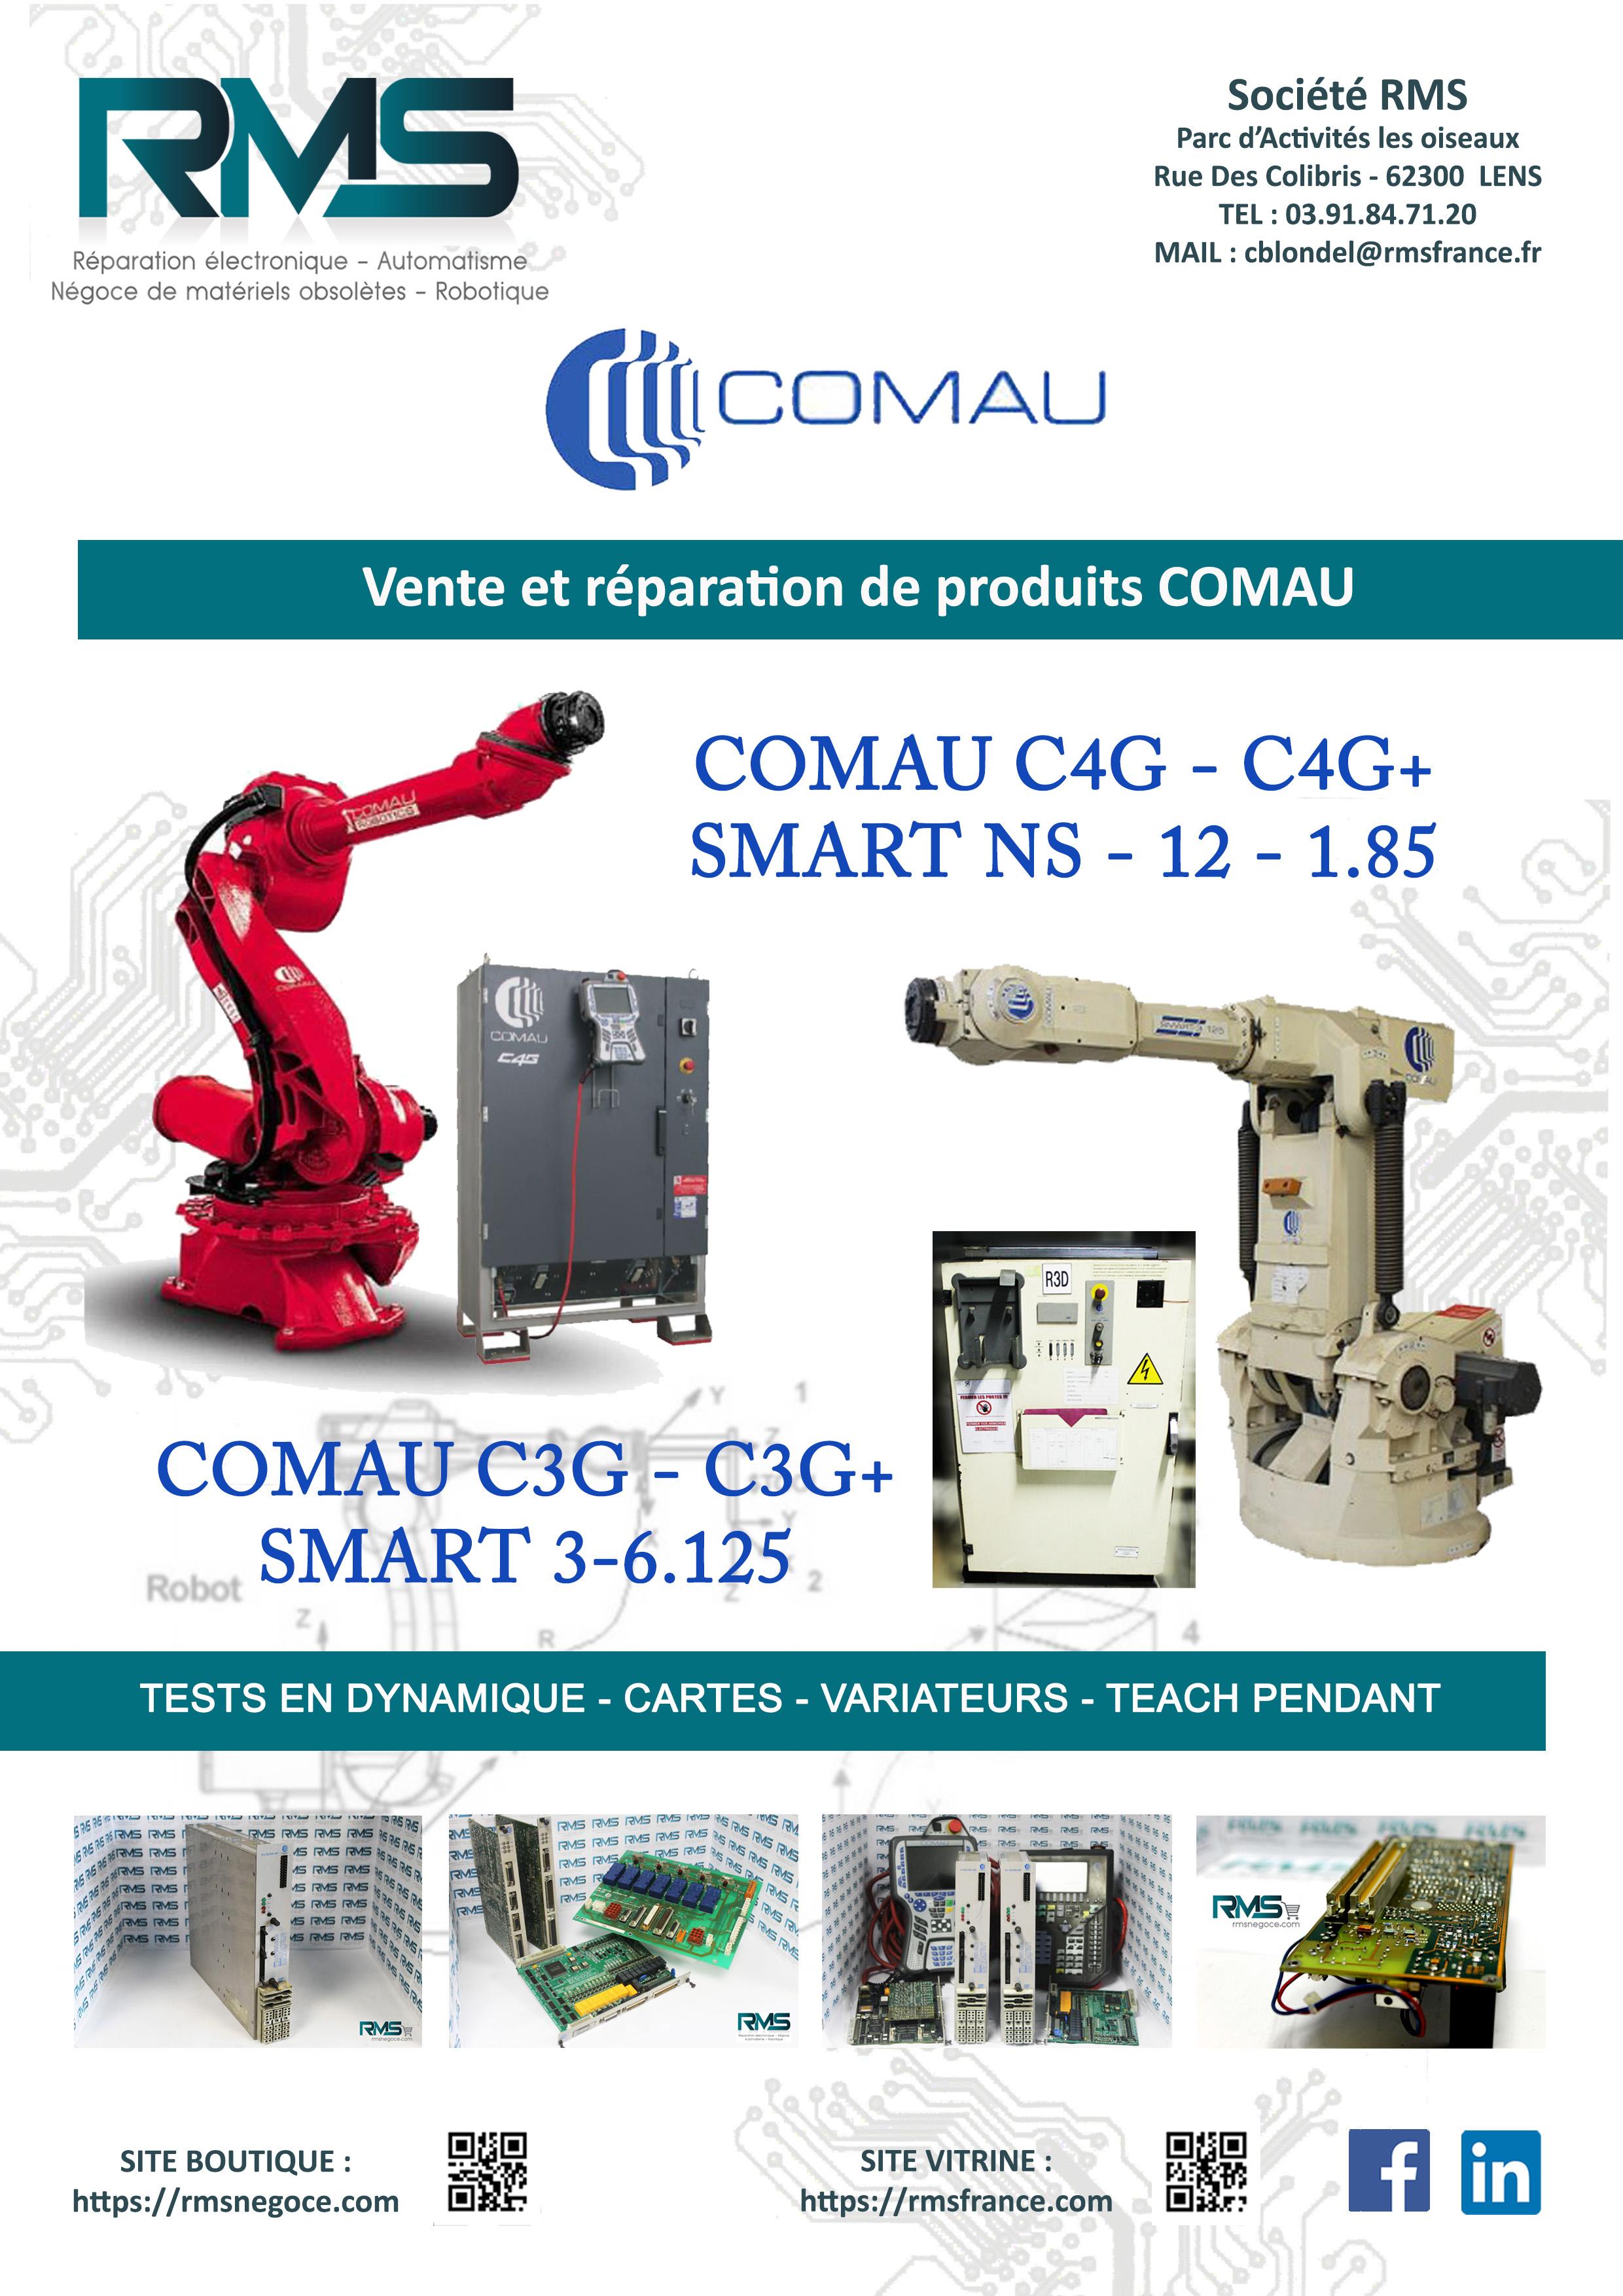 COMAU C3G - COMAU CG3 - RMS NEGOCE